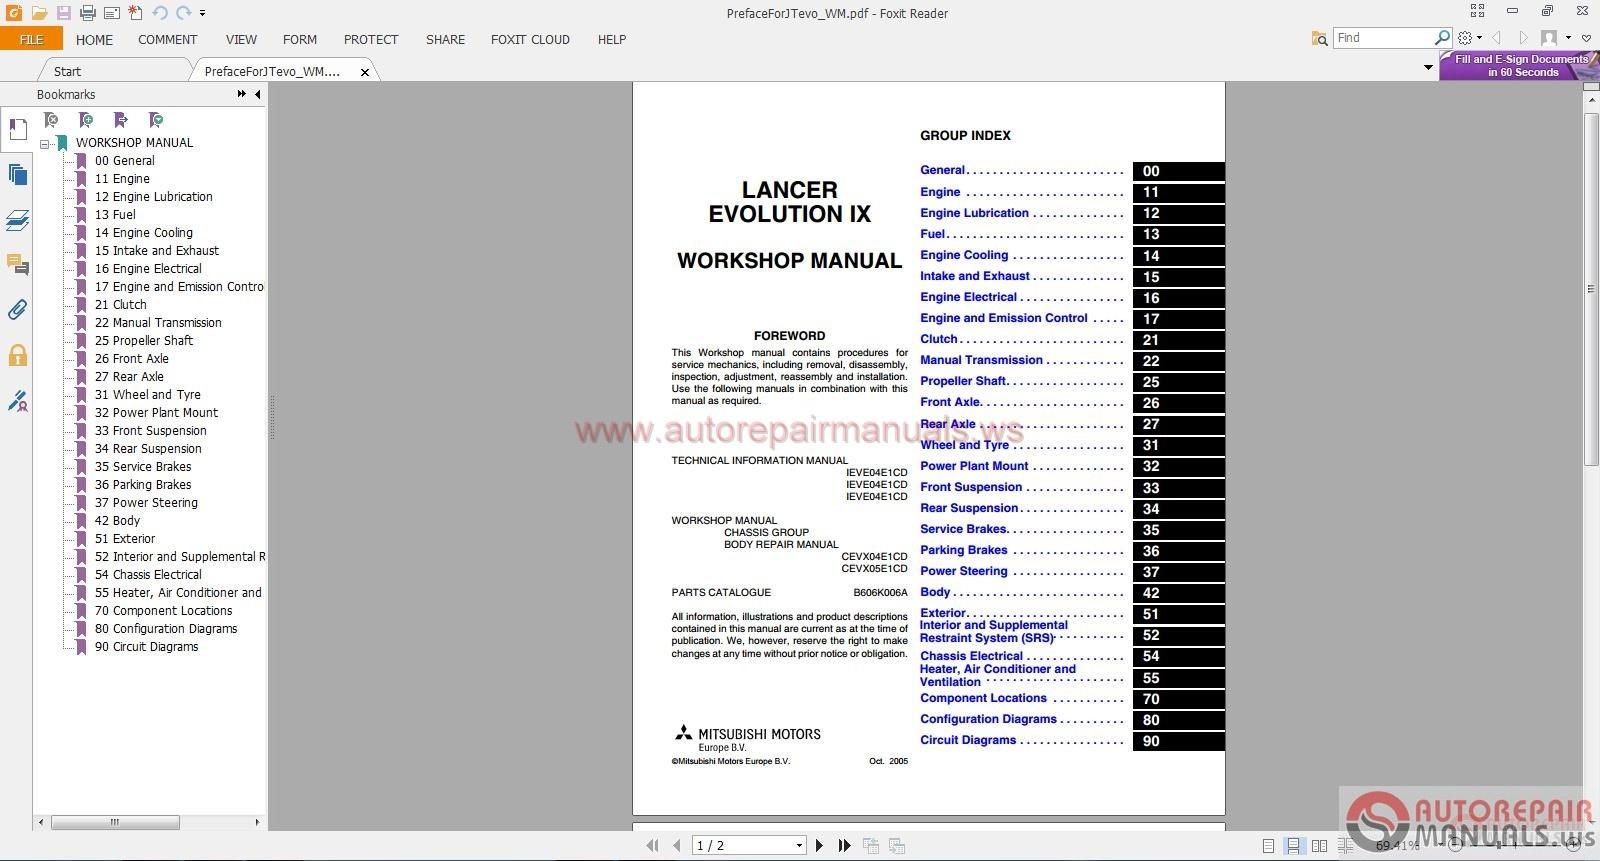 Ebook-4669] haynes repair manual mitsubishi colt 1400 | 2019 ebook.